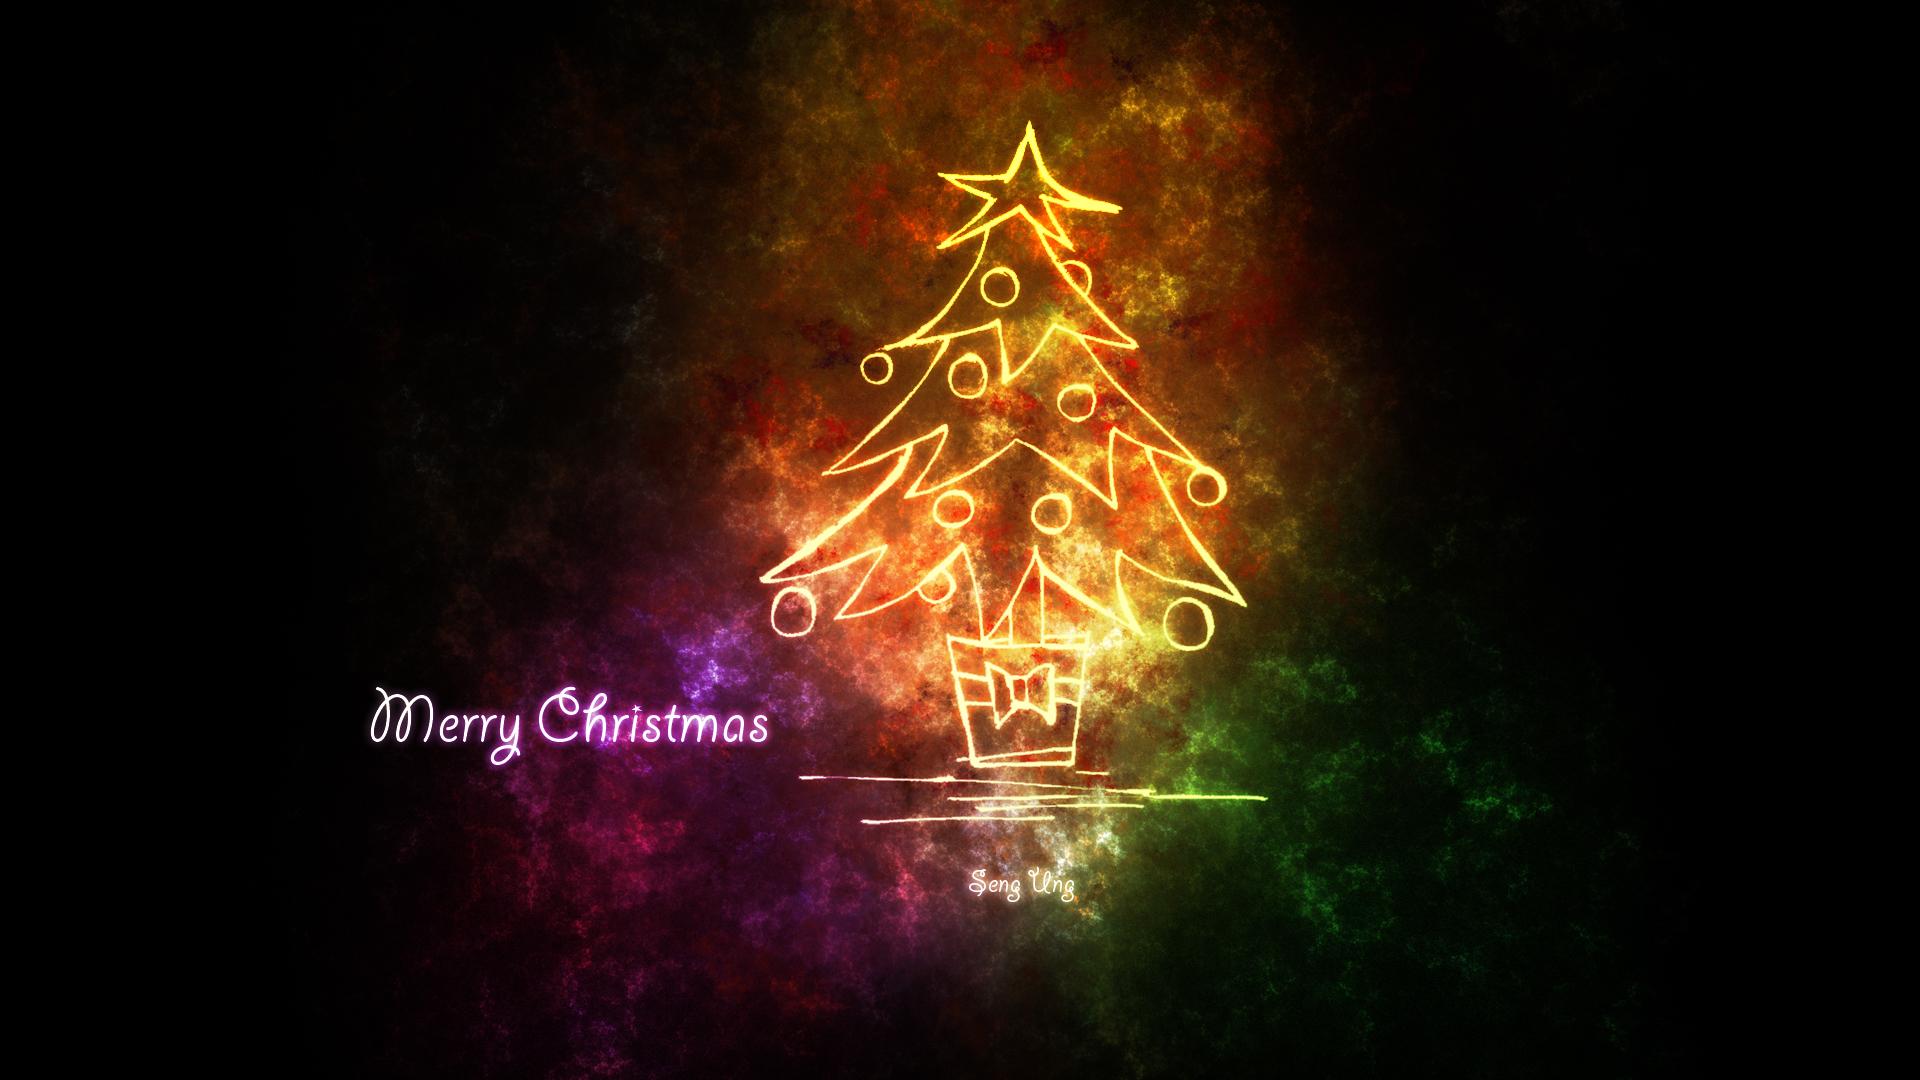 merry christmas 1080p wallpaperdrkzin on deviantart